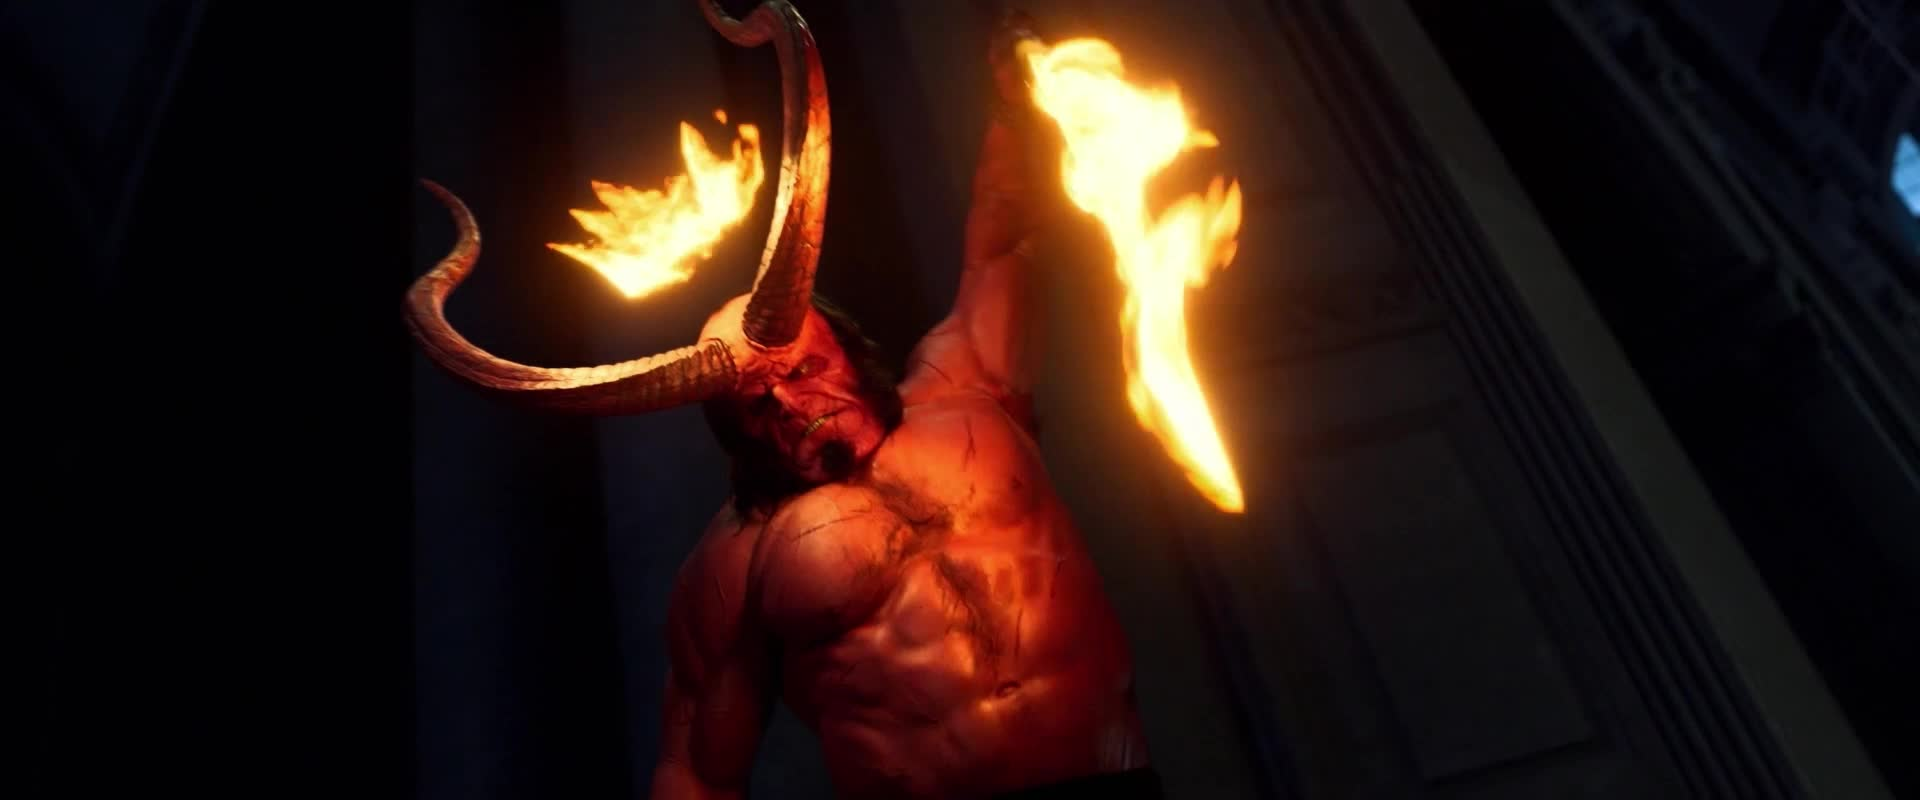 dark horse, dark horse comics, david harbour, hellboy, hellboy 2019, hellboy movie, milla jovovich, superhero, superheroes, Hellboy Teaser GIFs